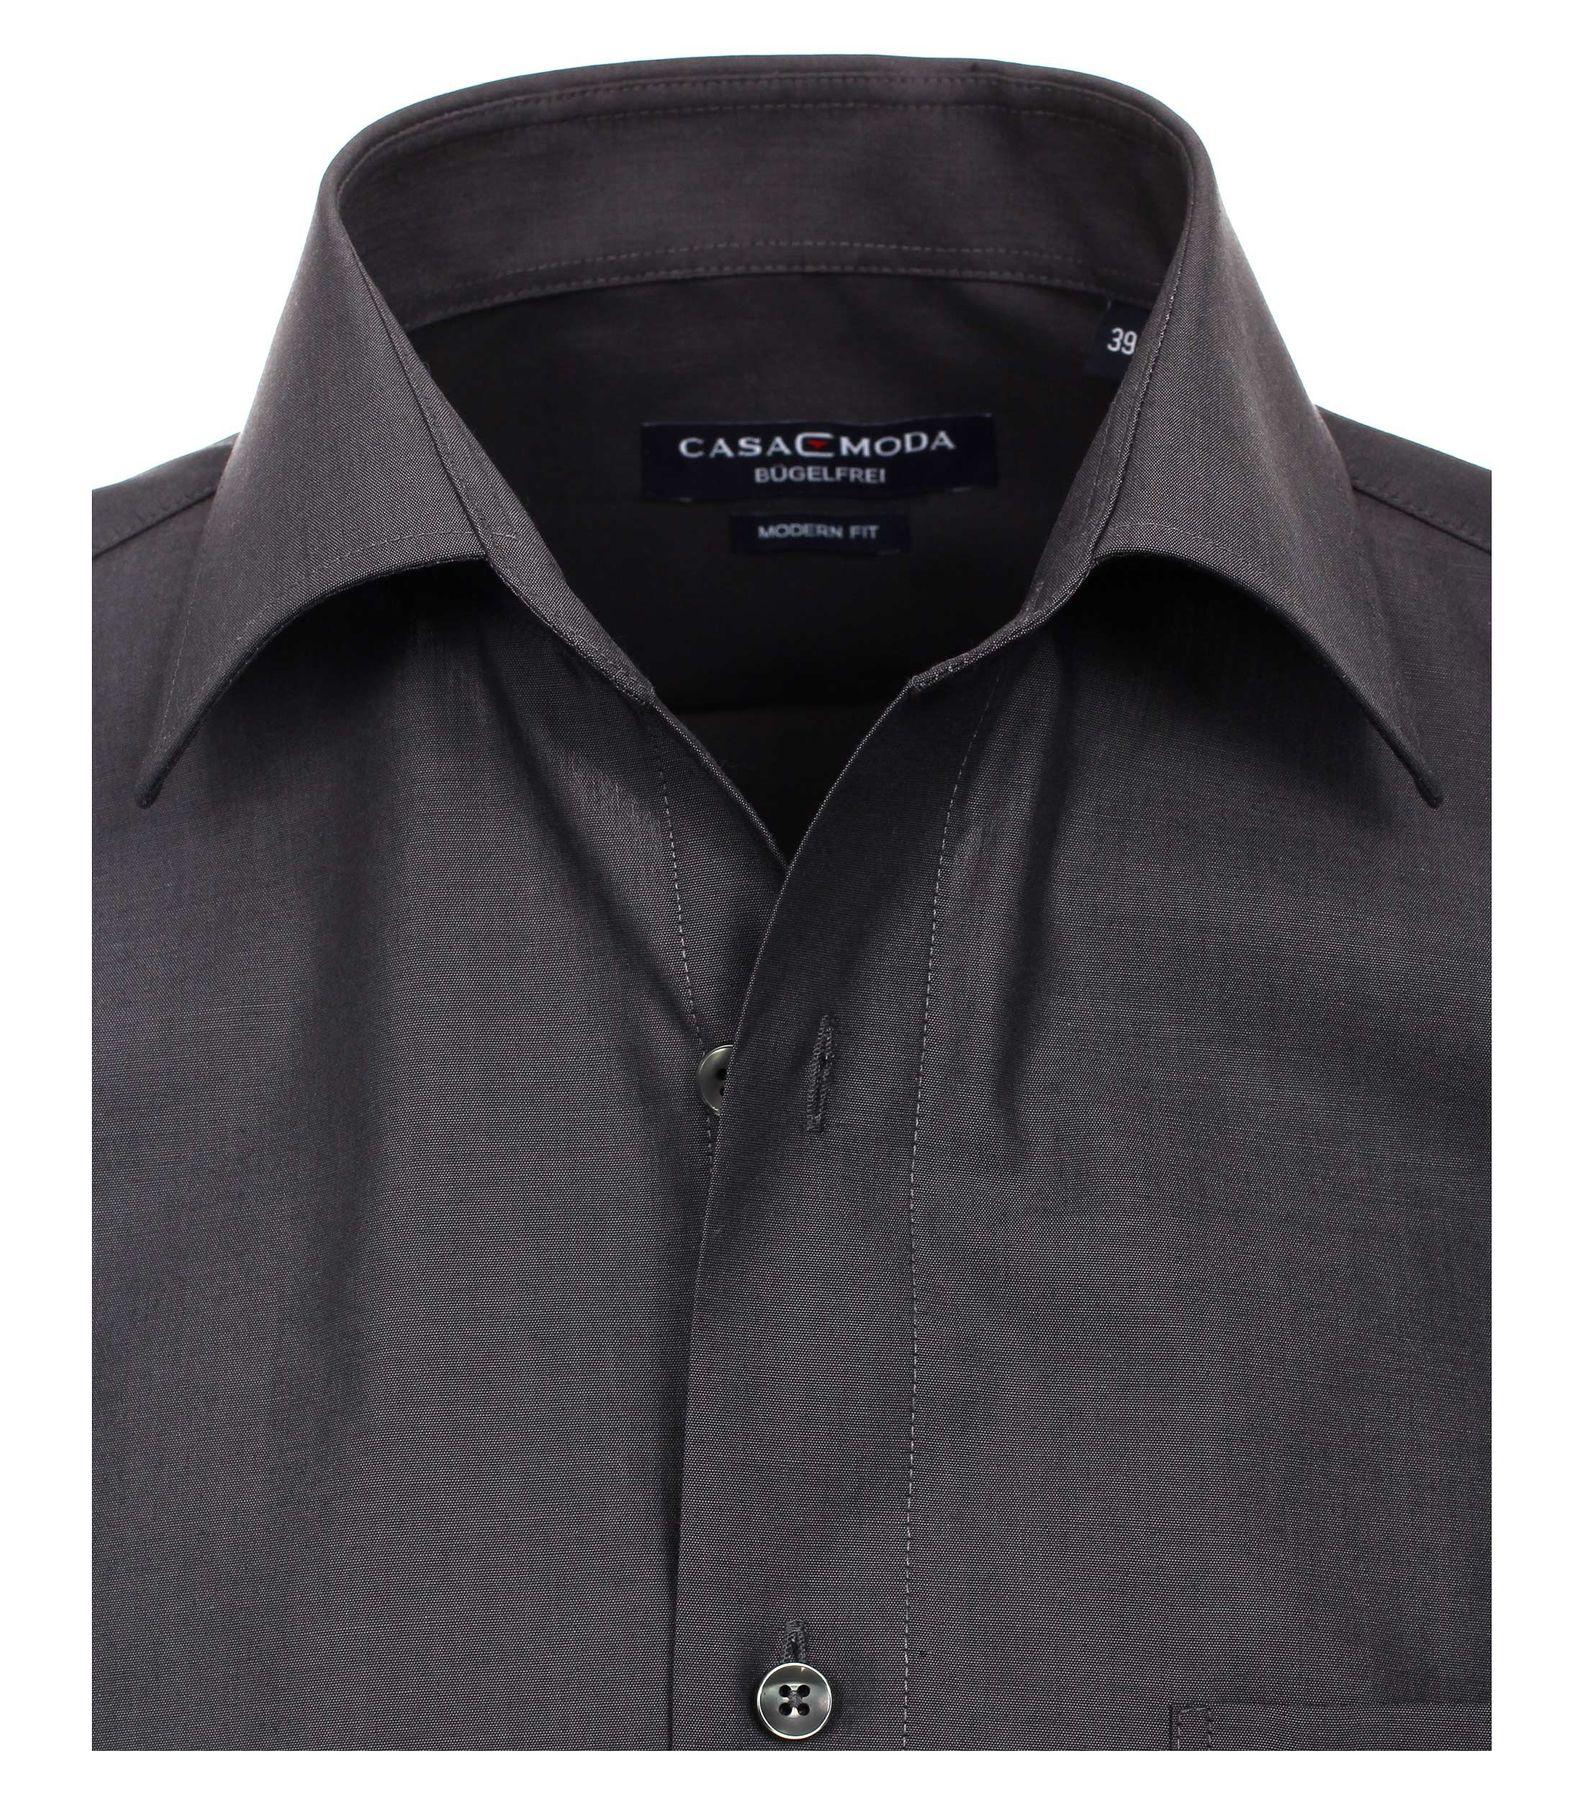 Casamoda - Modern Fit - Bügelfreies Herren Business Langarm Hemd verschiedene Farben (006560A) – Bild 19